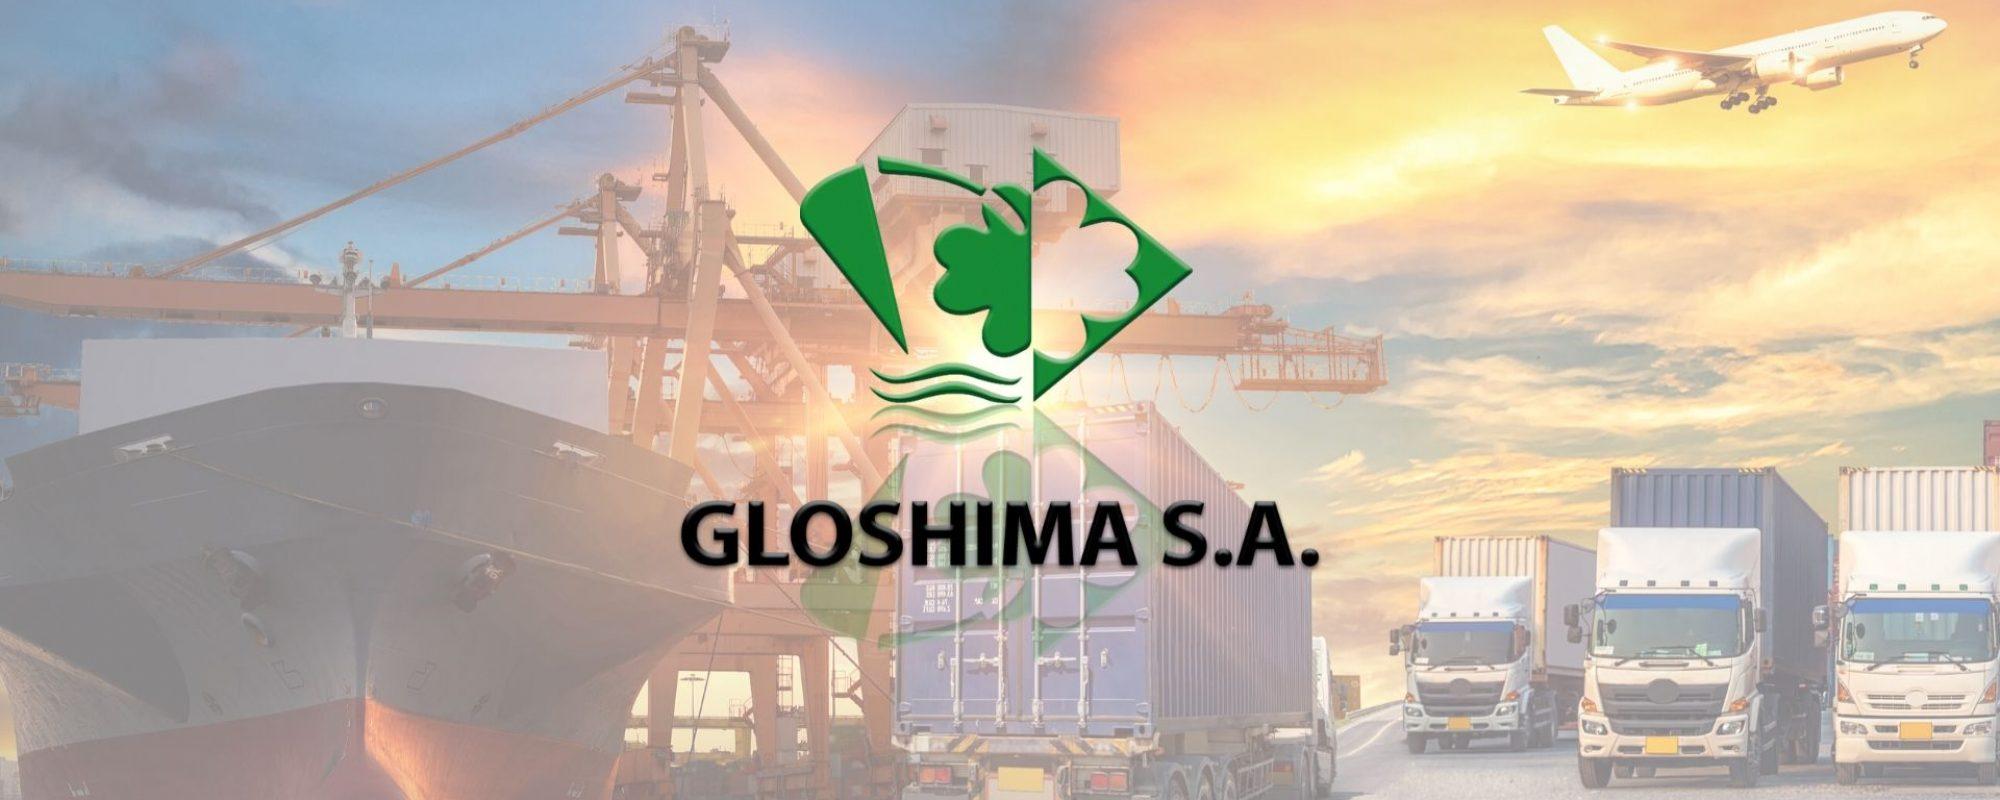 Próximamente Gloshima